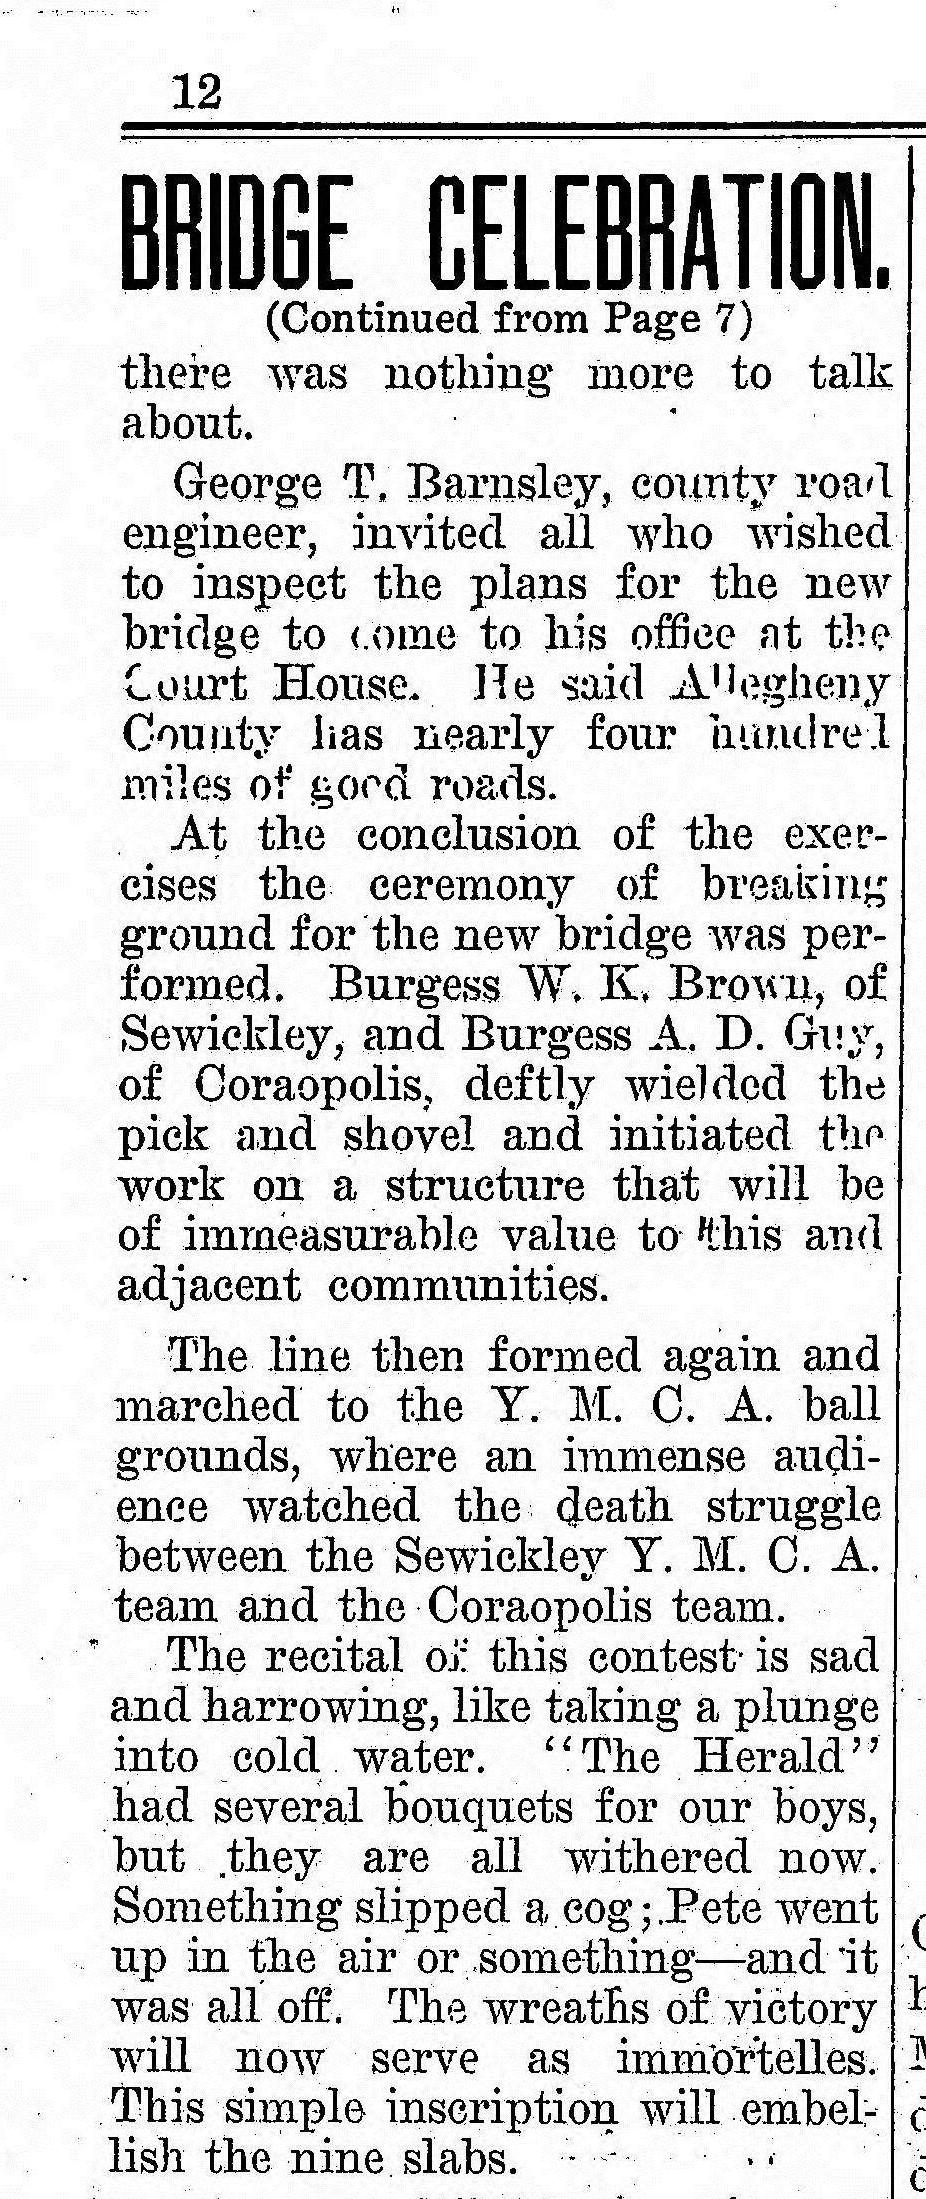 1909-07-24 The Weekly Herald (Sewickley Herald) - Bridge Celebration (pg12).jpg